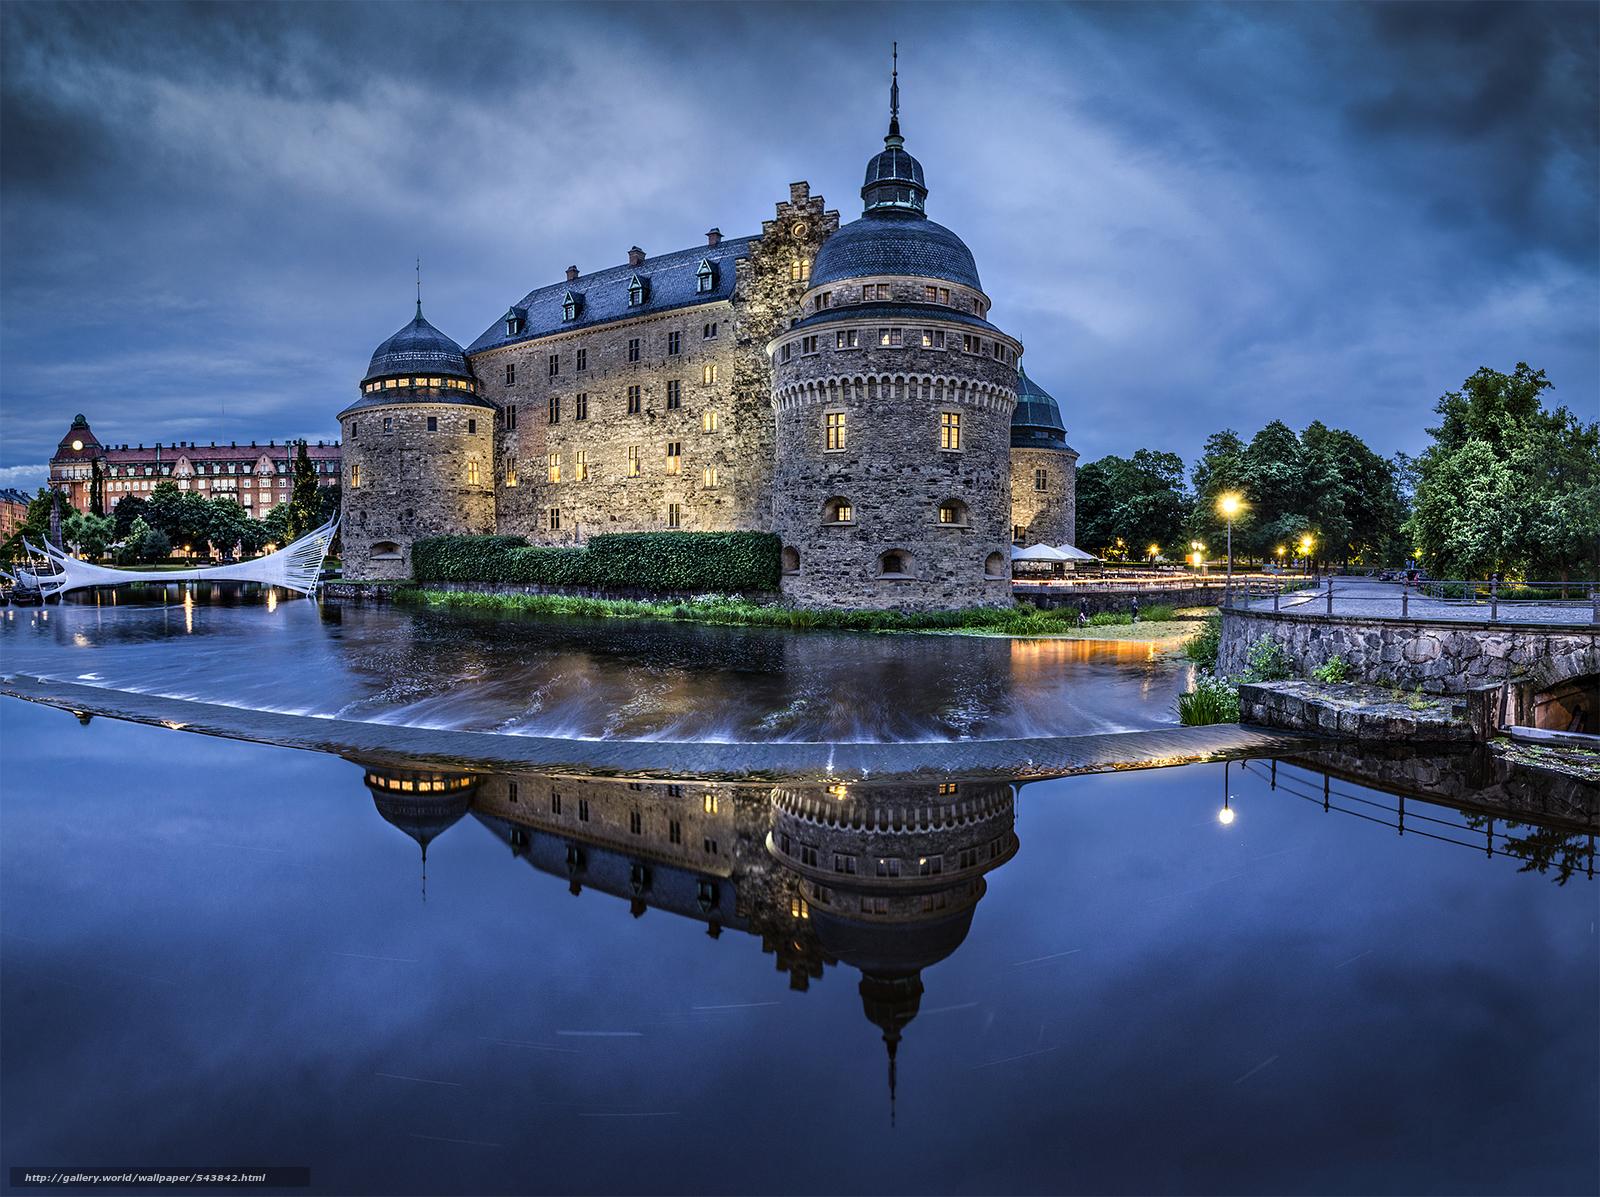 wallpaper Orebro castle Orebro Sweden desktop wallpaper 1600x1197